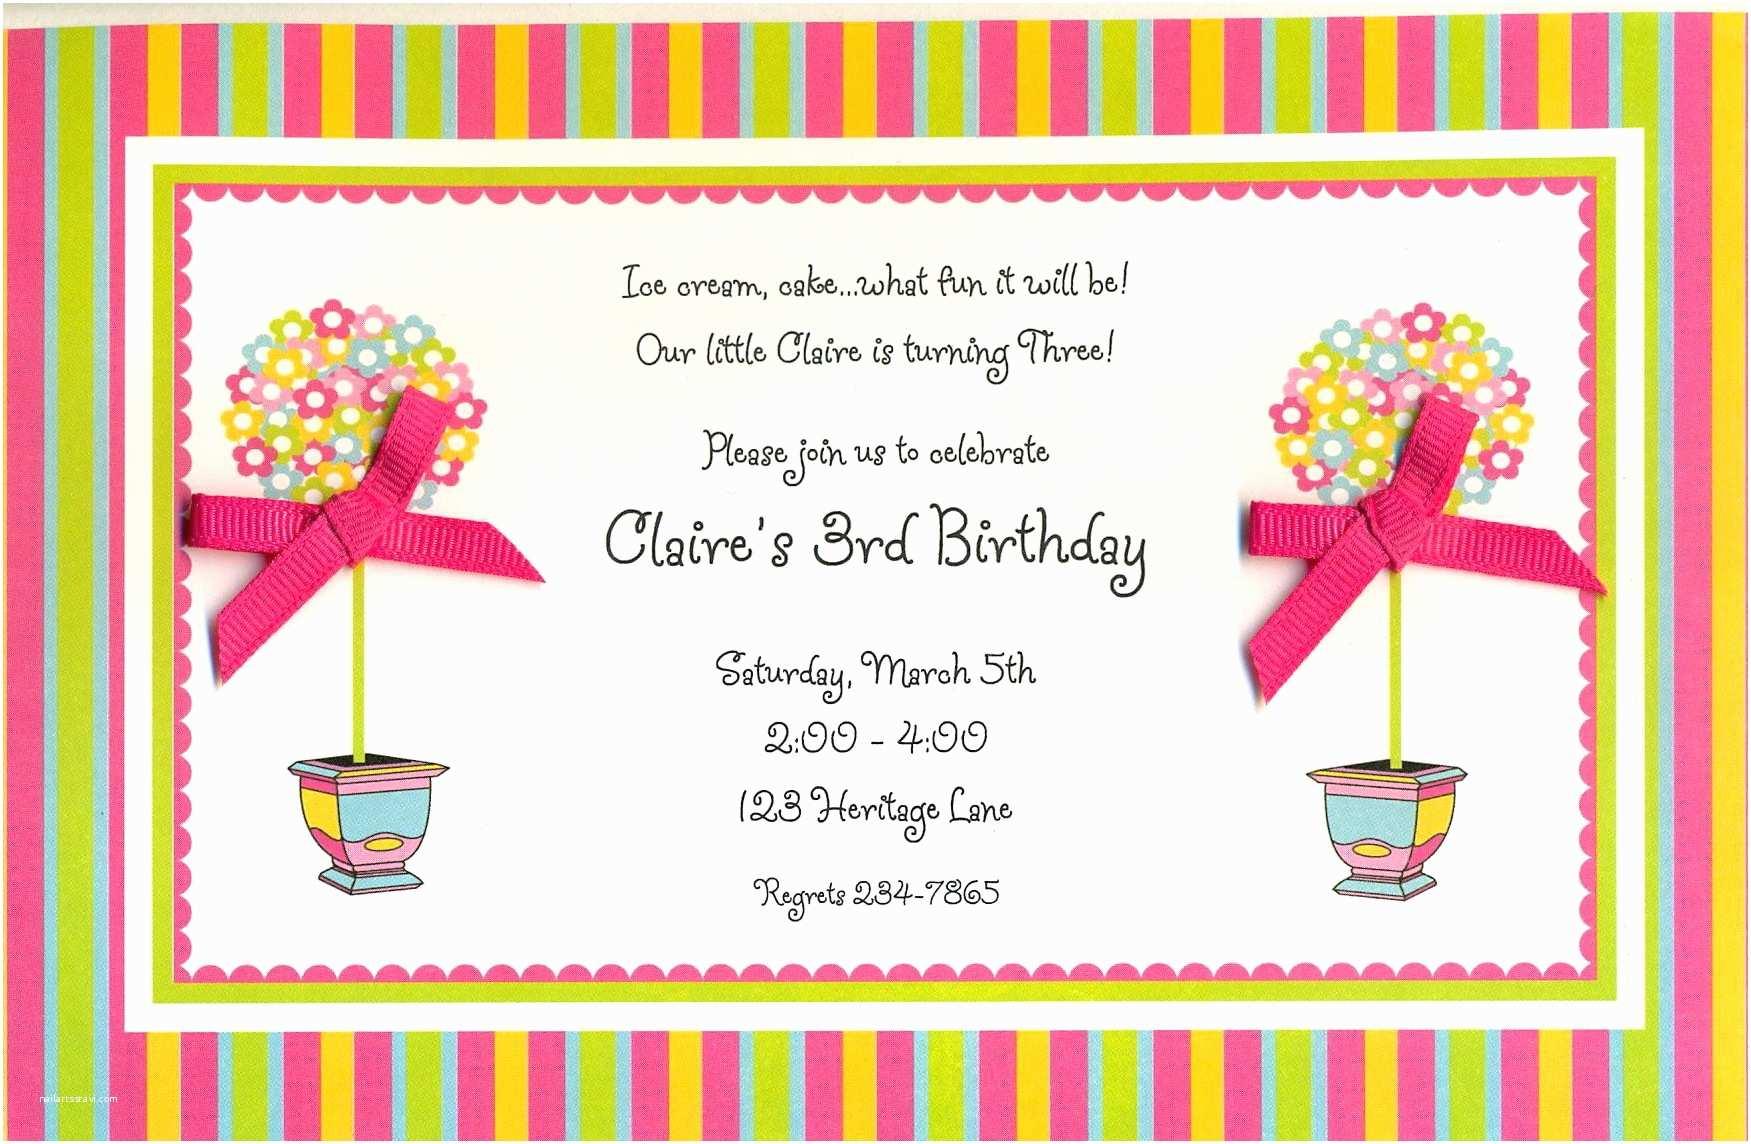 Birthday Party Invitation Text Birthday Dinner Party Invitation Wording